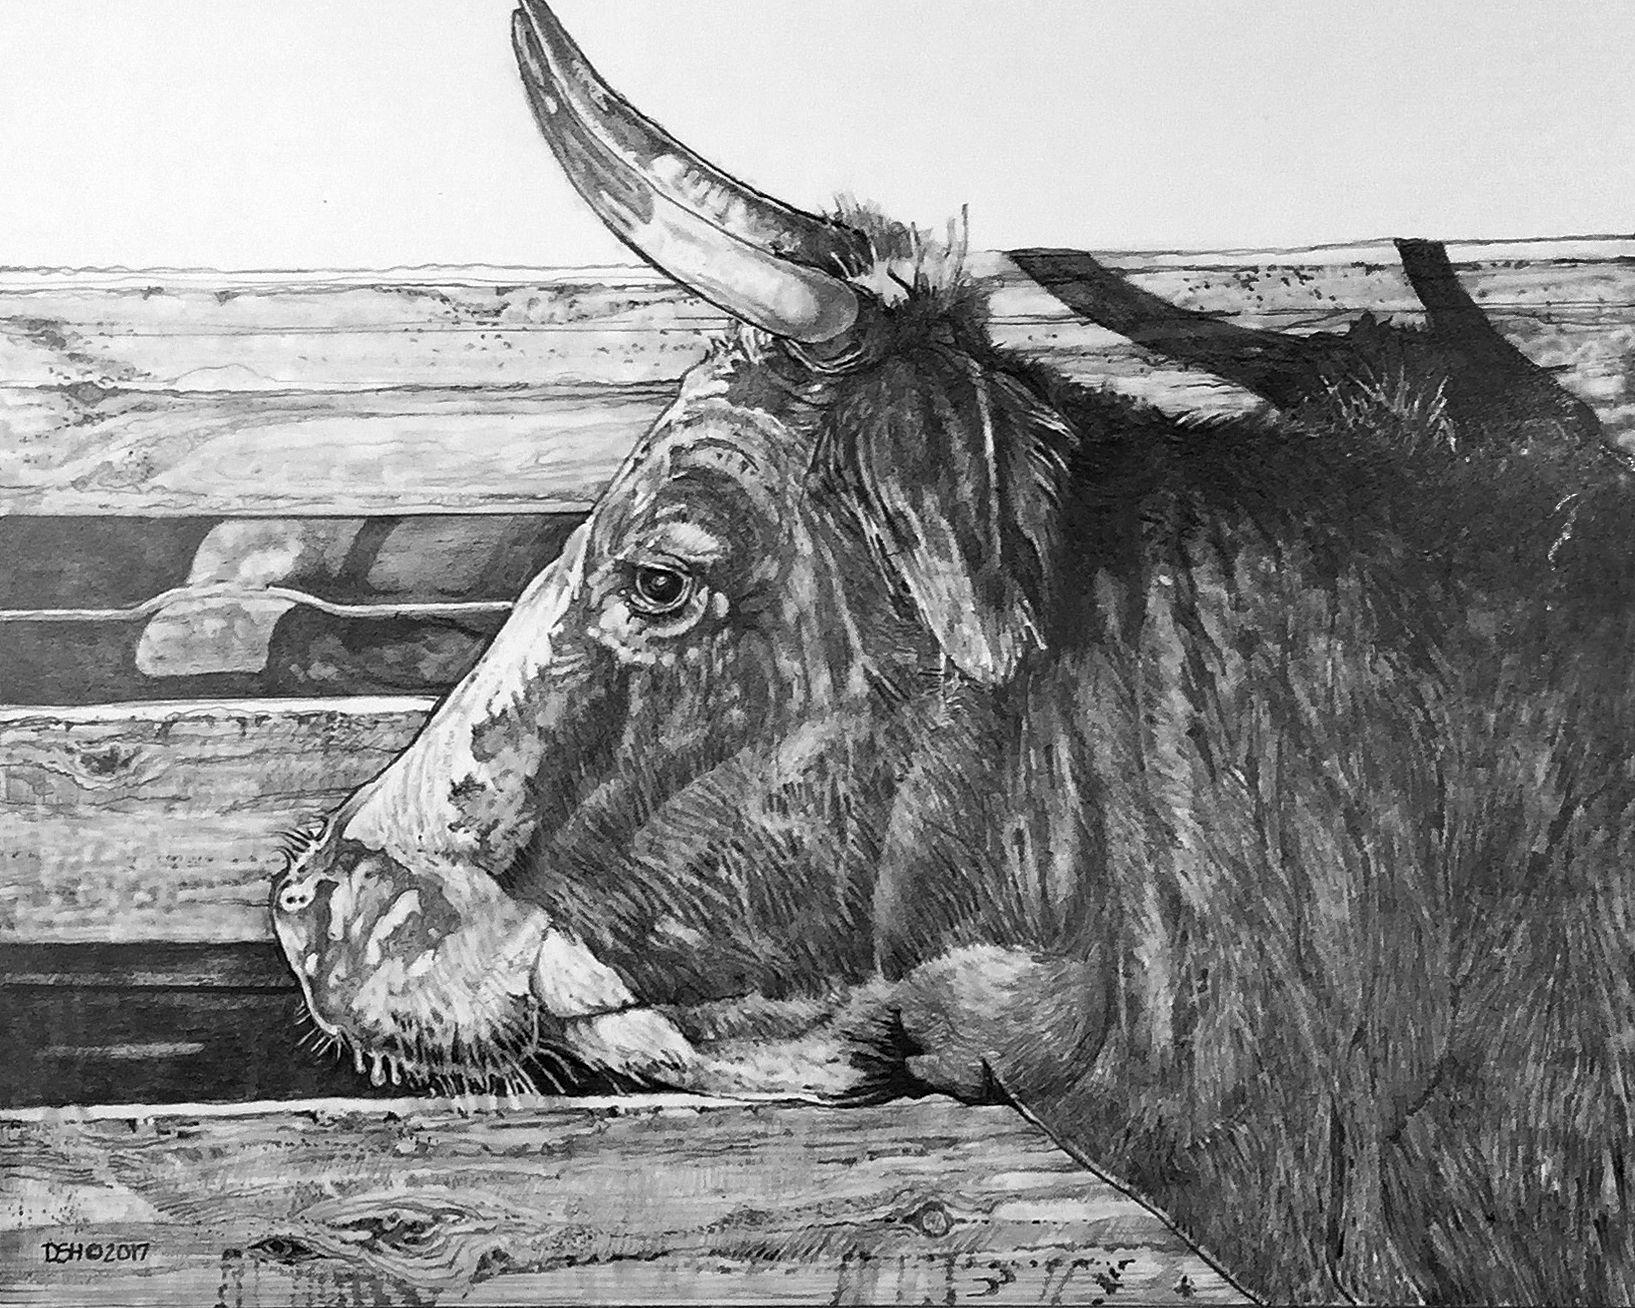 Cattle Drawing David Haley C Copyright 2018 D S Haley Artwork